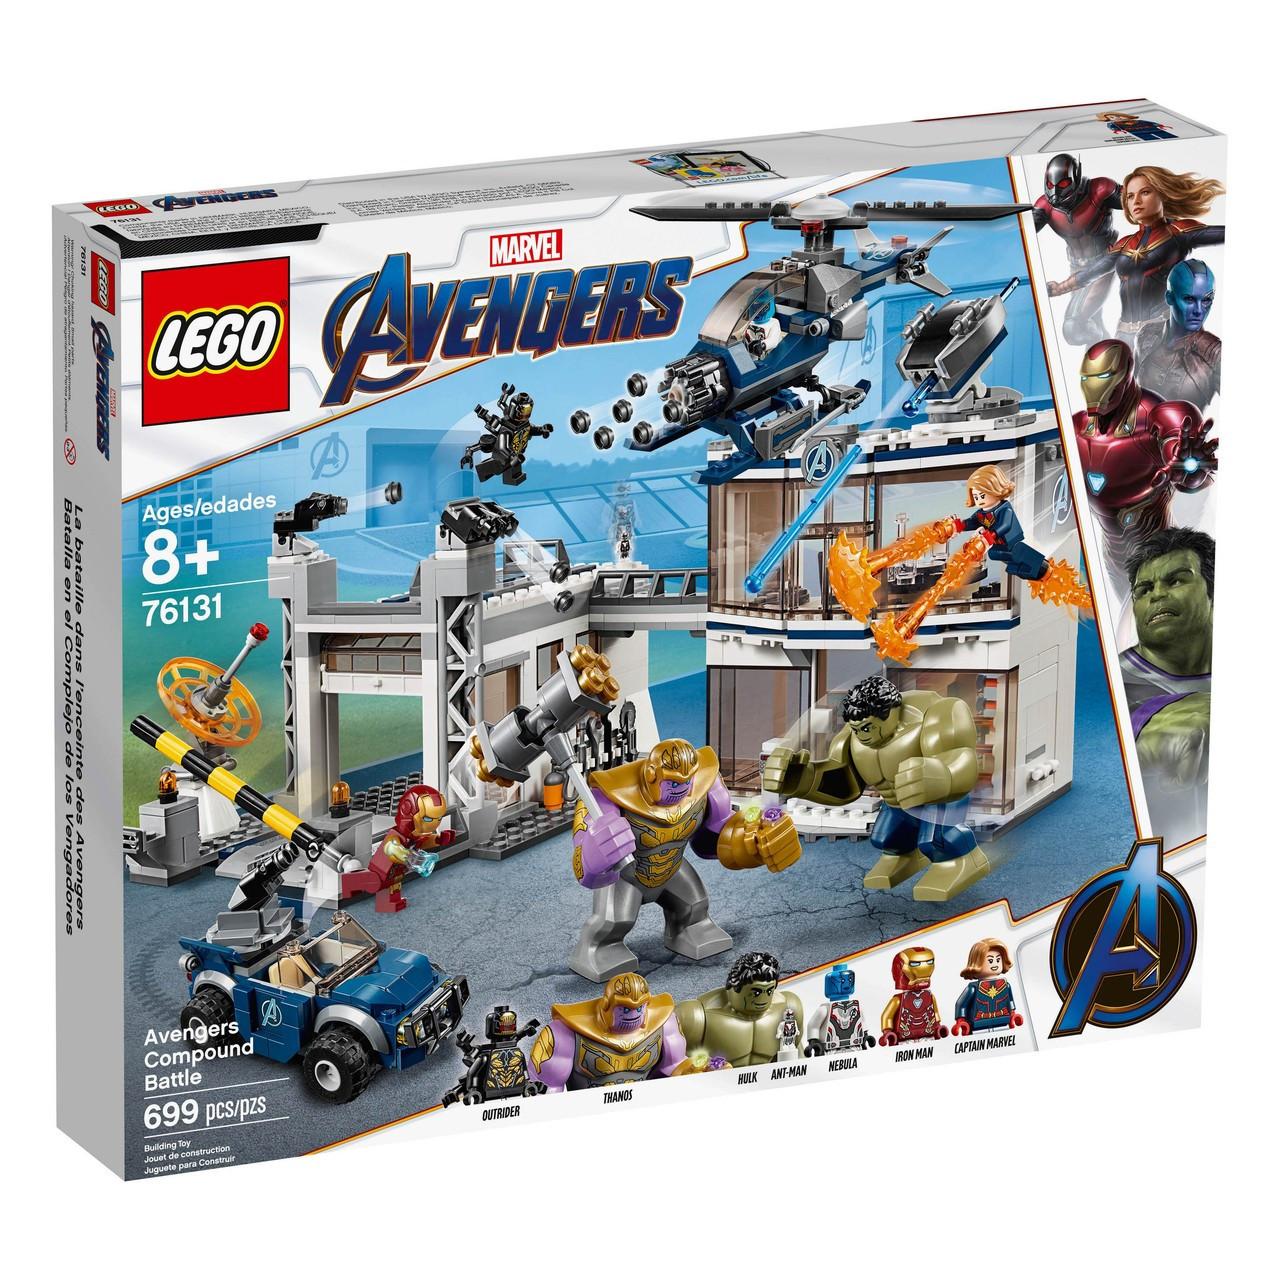 LEGO Marvel Super Heroes Hawkeye MINIFIG from Lego set #76126 Brand New